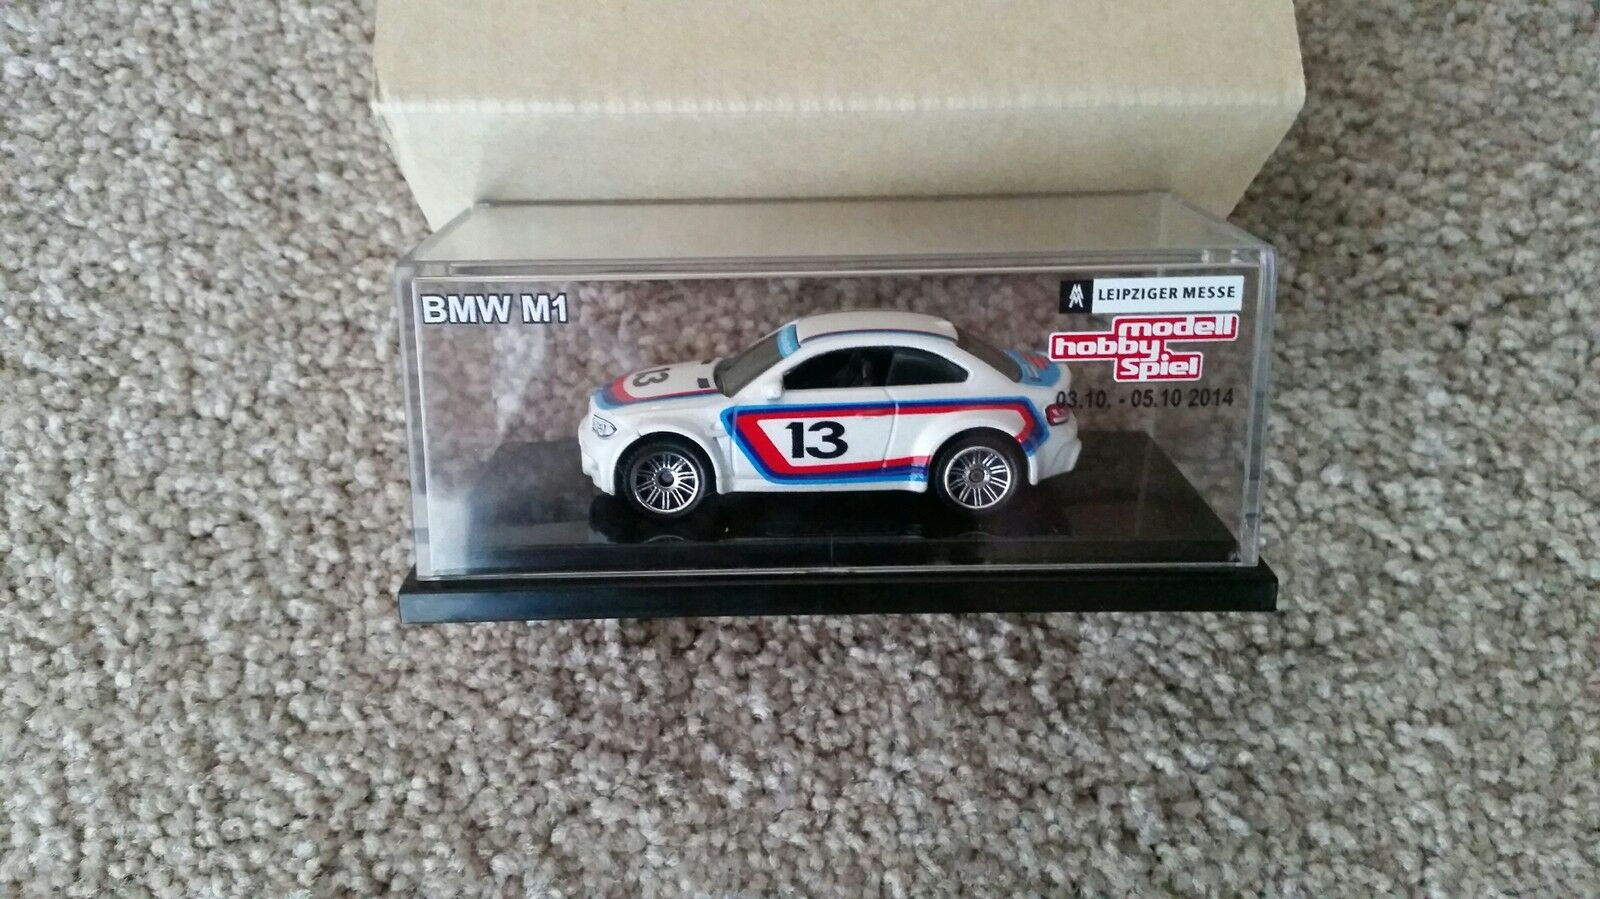 Matchbox BMW 1M M1 Coupe 2014 1 500 Leipzig Germany Toy Fair E82 1er 135i